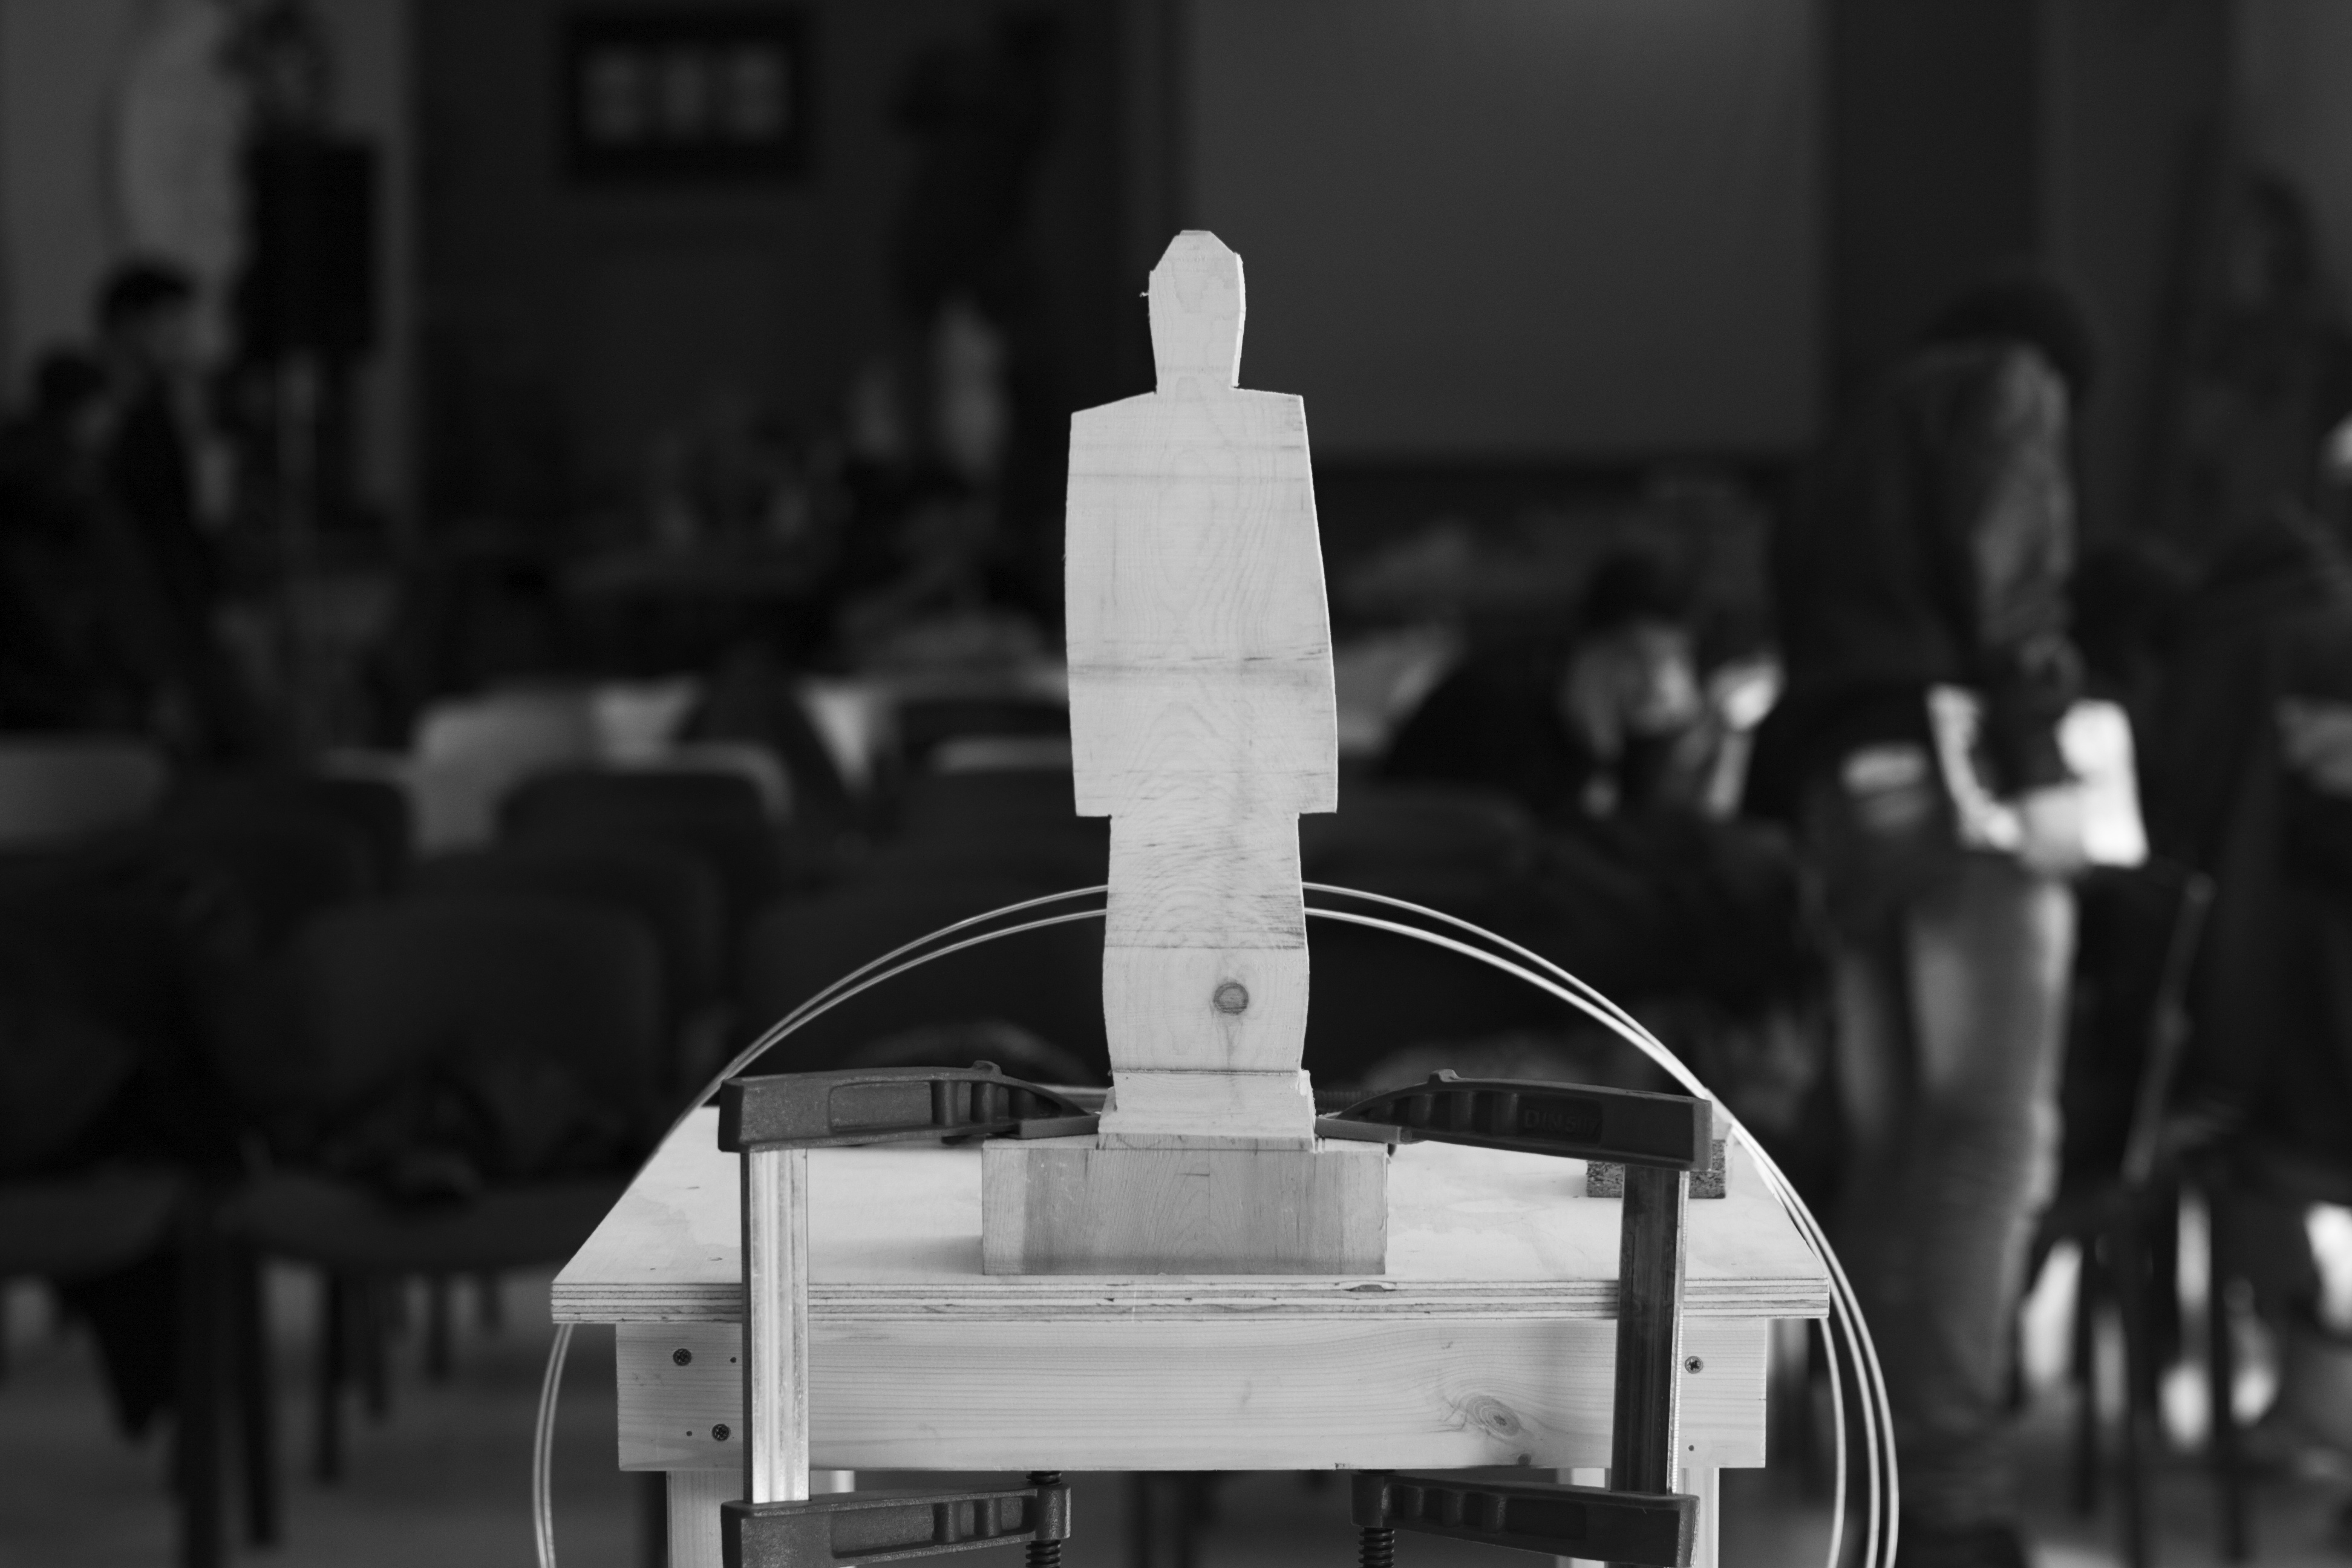 Flickr - Aron Demetz - Dialoghi e materia - Workshop a cura di Franco Reina18